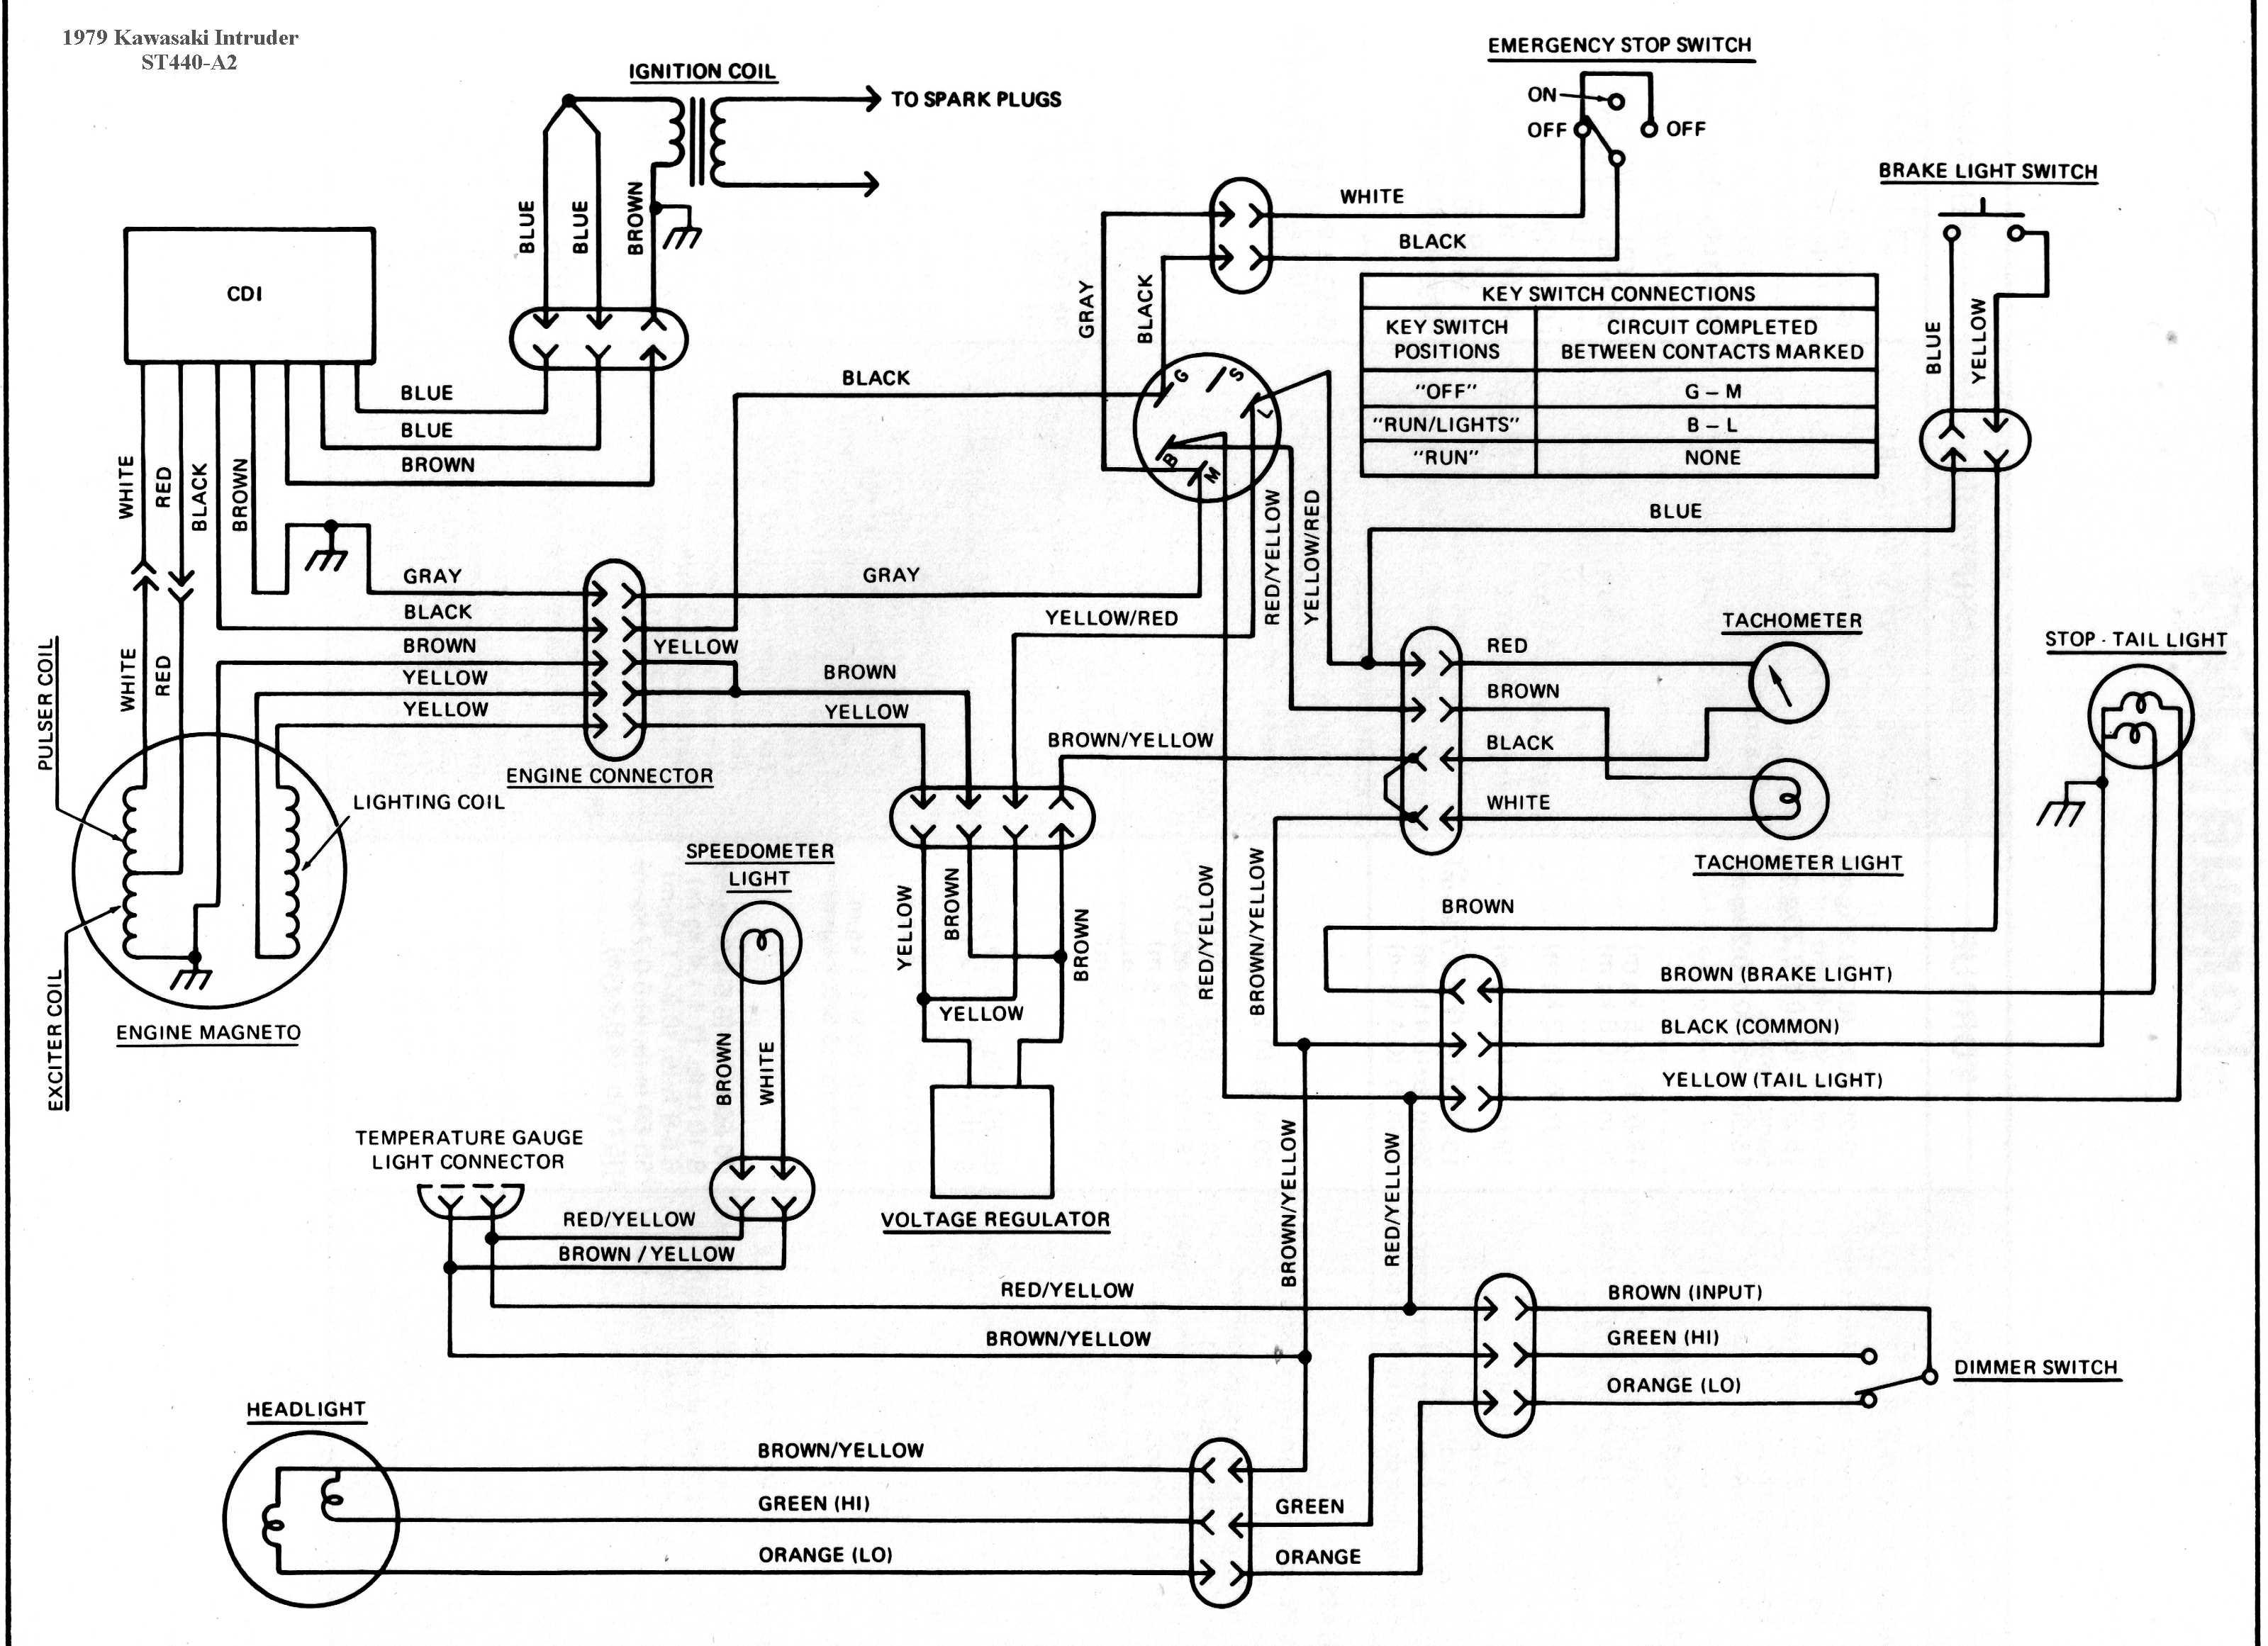 1987 kawasaki bayou 300 wiring diagram single phase motor with capacitor forward and reverse mule ignition